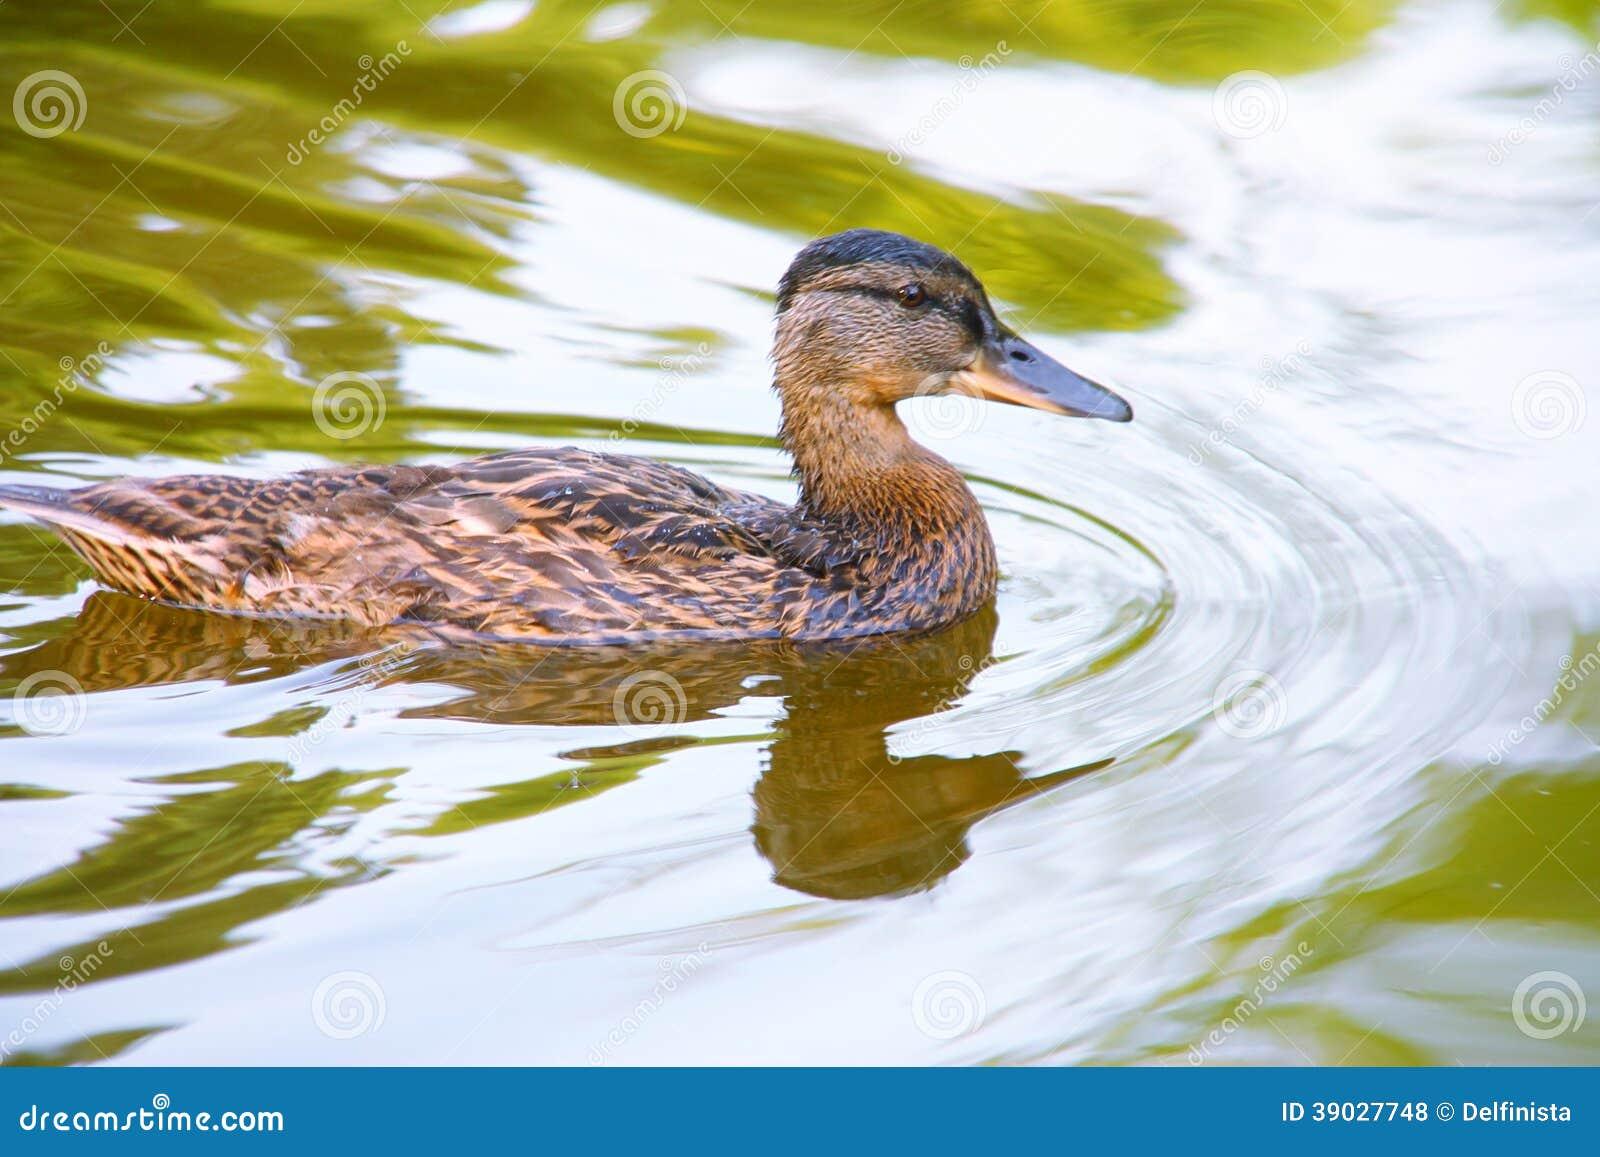 Duck in green water - Stock Photos